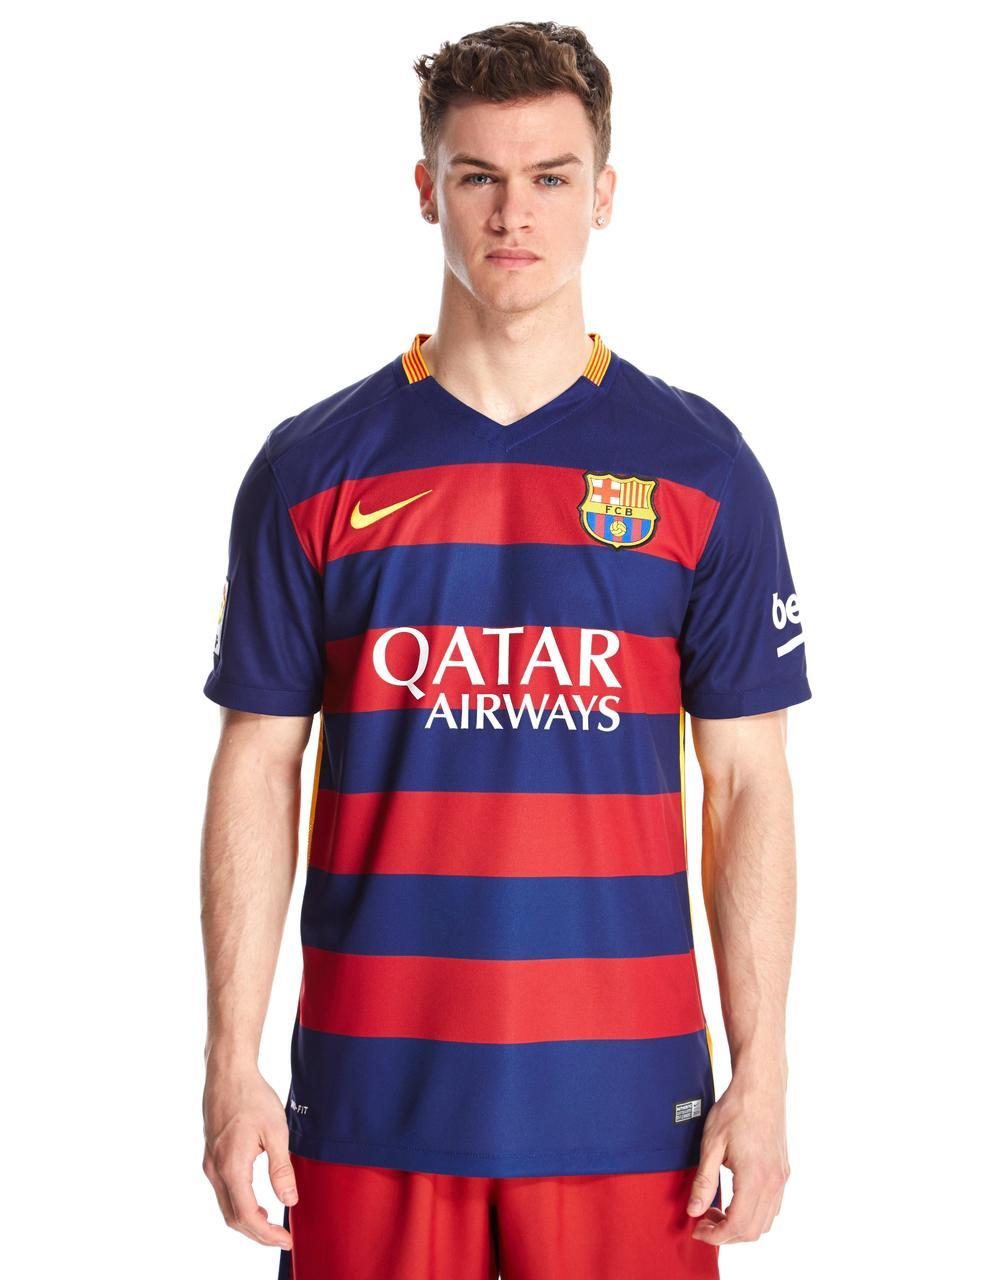 Camiseta del Barça para la temporada 2015/2016 (FC Barcelona).